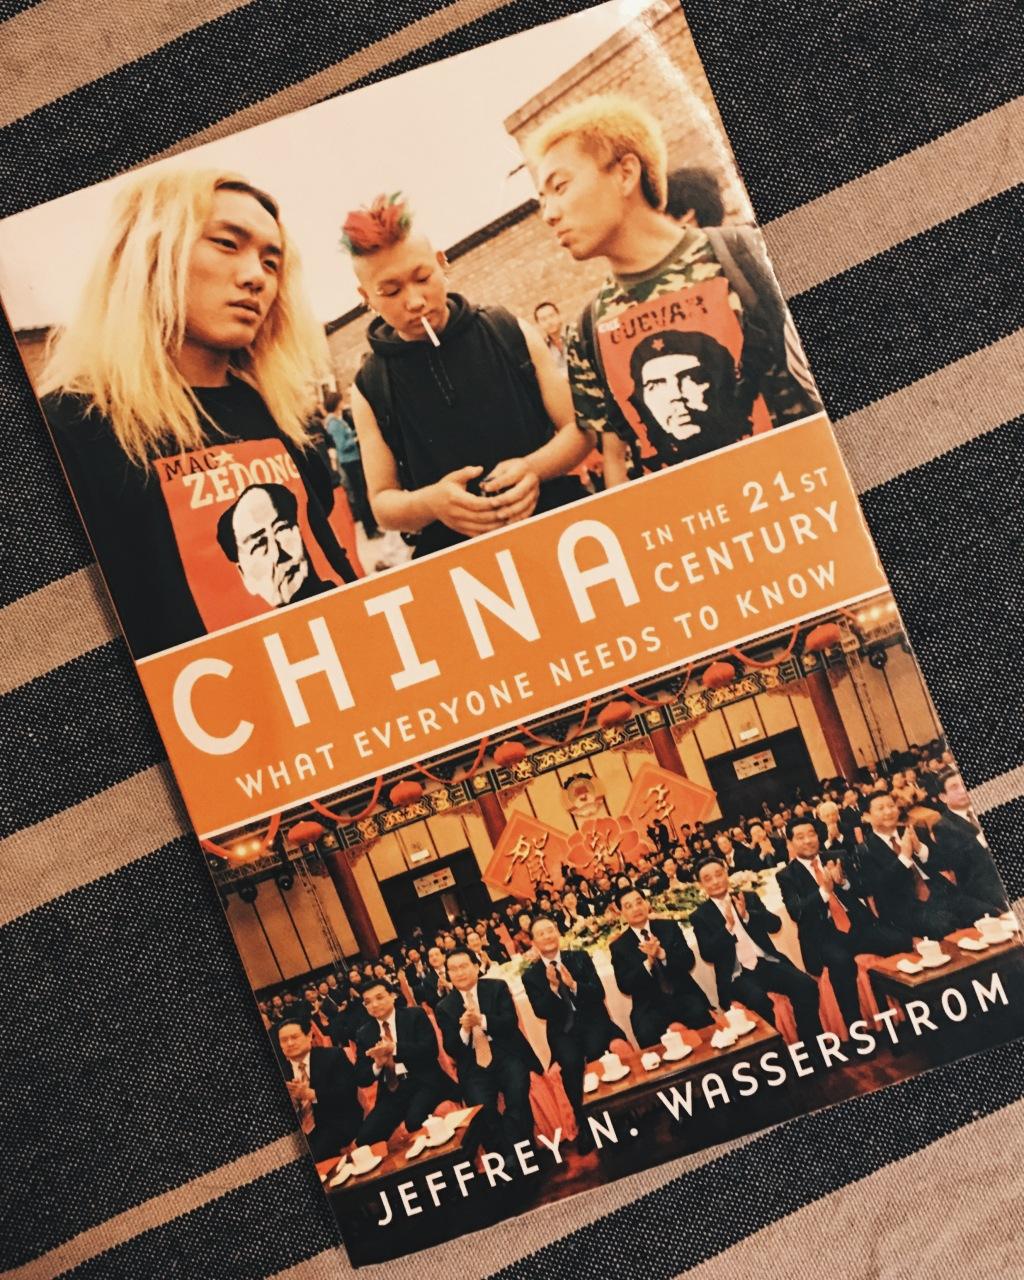 Wasserstrom's China in the 21st Century